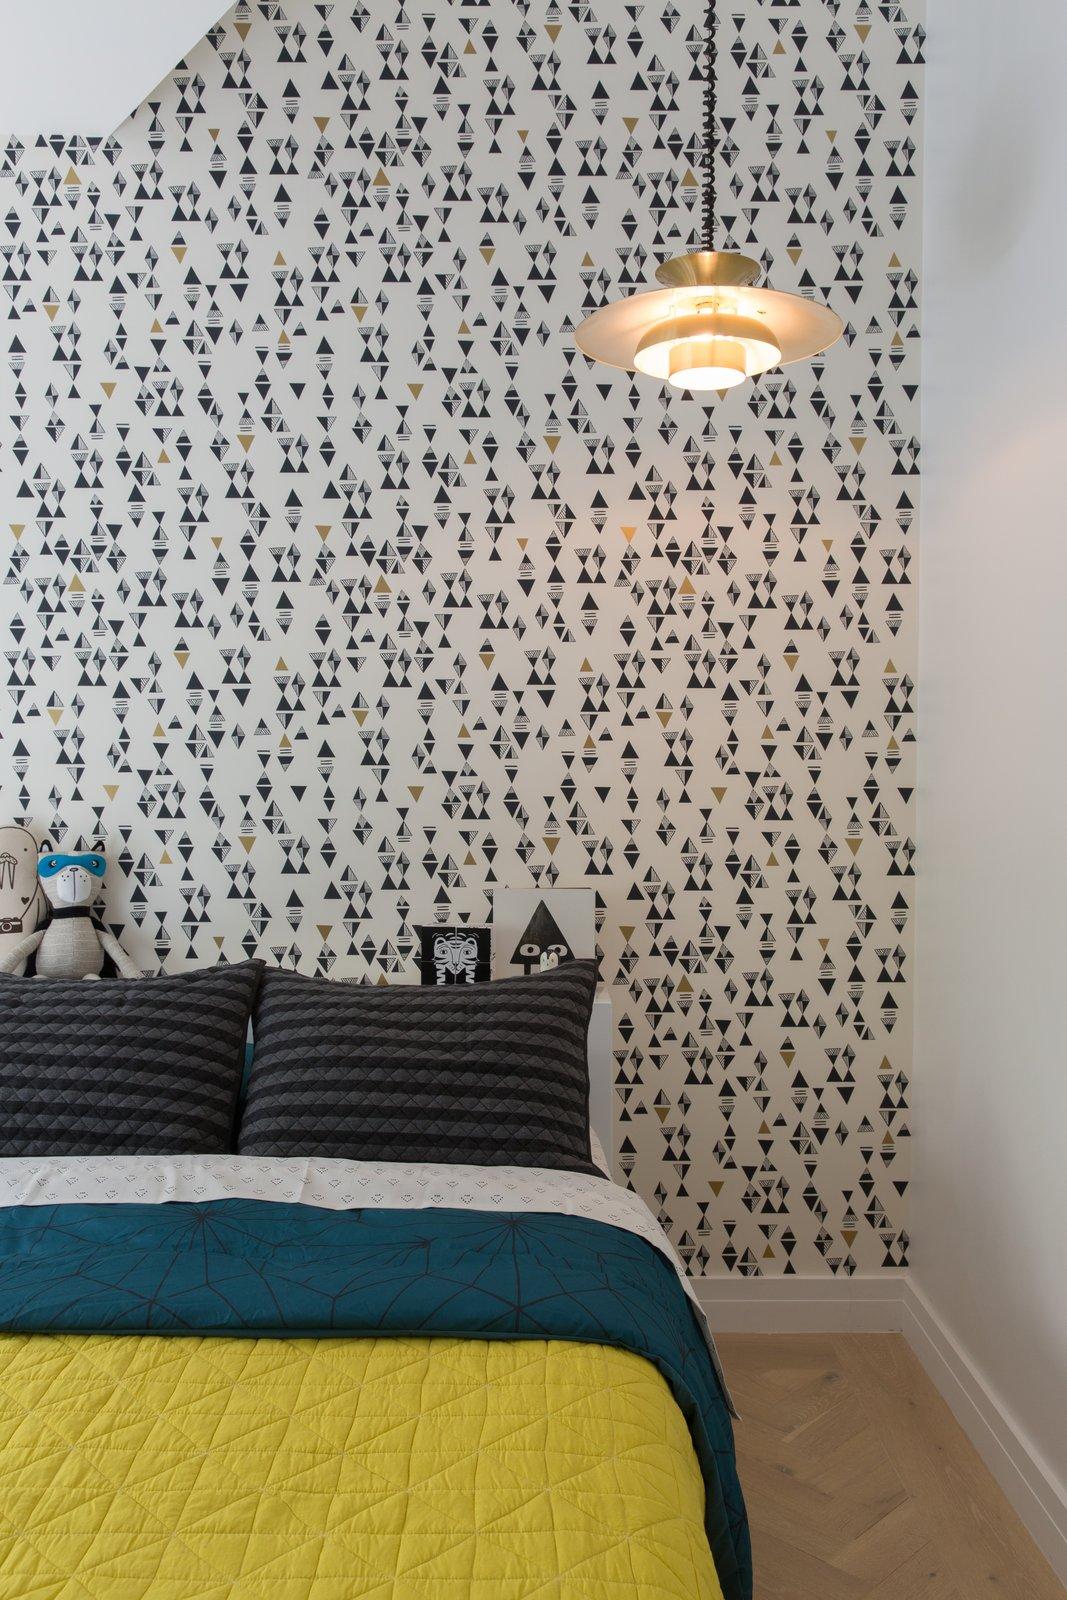 Bedroom, Light Hardwood Floor, Pendant Lighting, Recessed Lighting, and Bed  Best Photos from 1980s Modern Meets The New Millennium